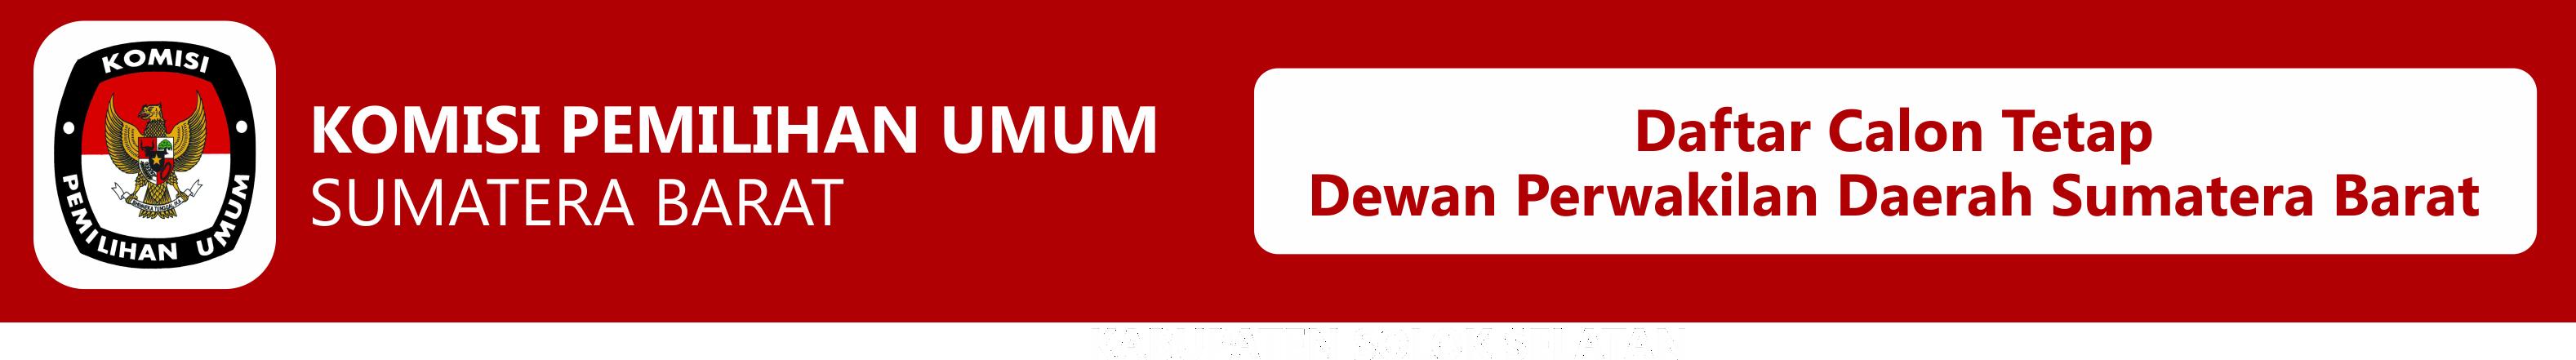 IKLAN DPD SUMBAR DEKSTOP